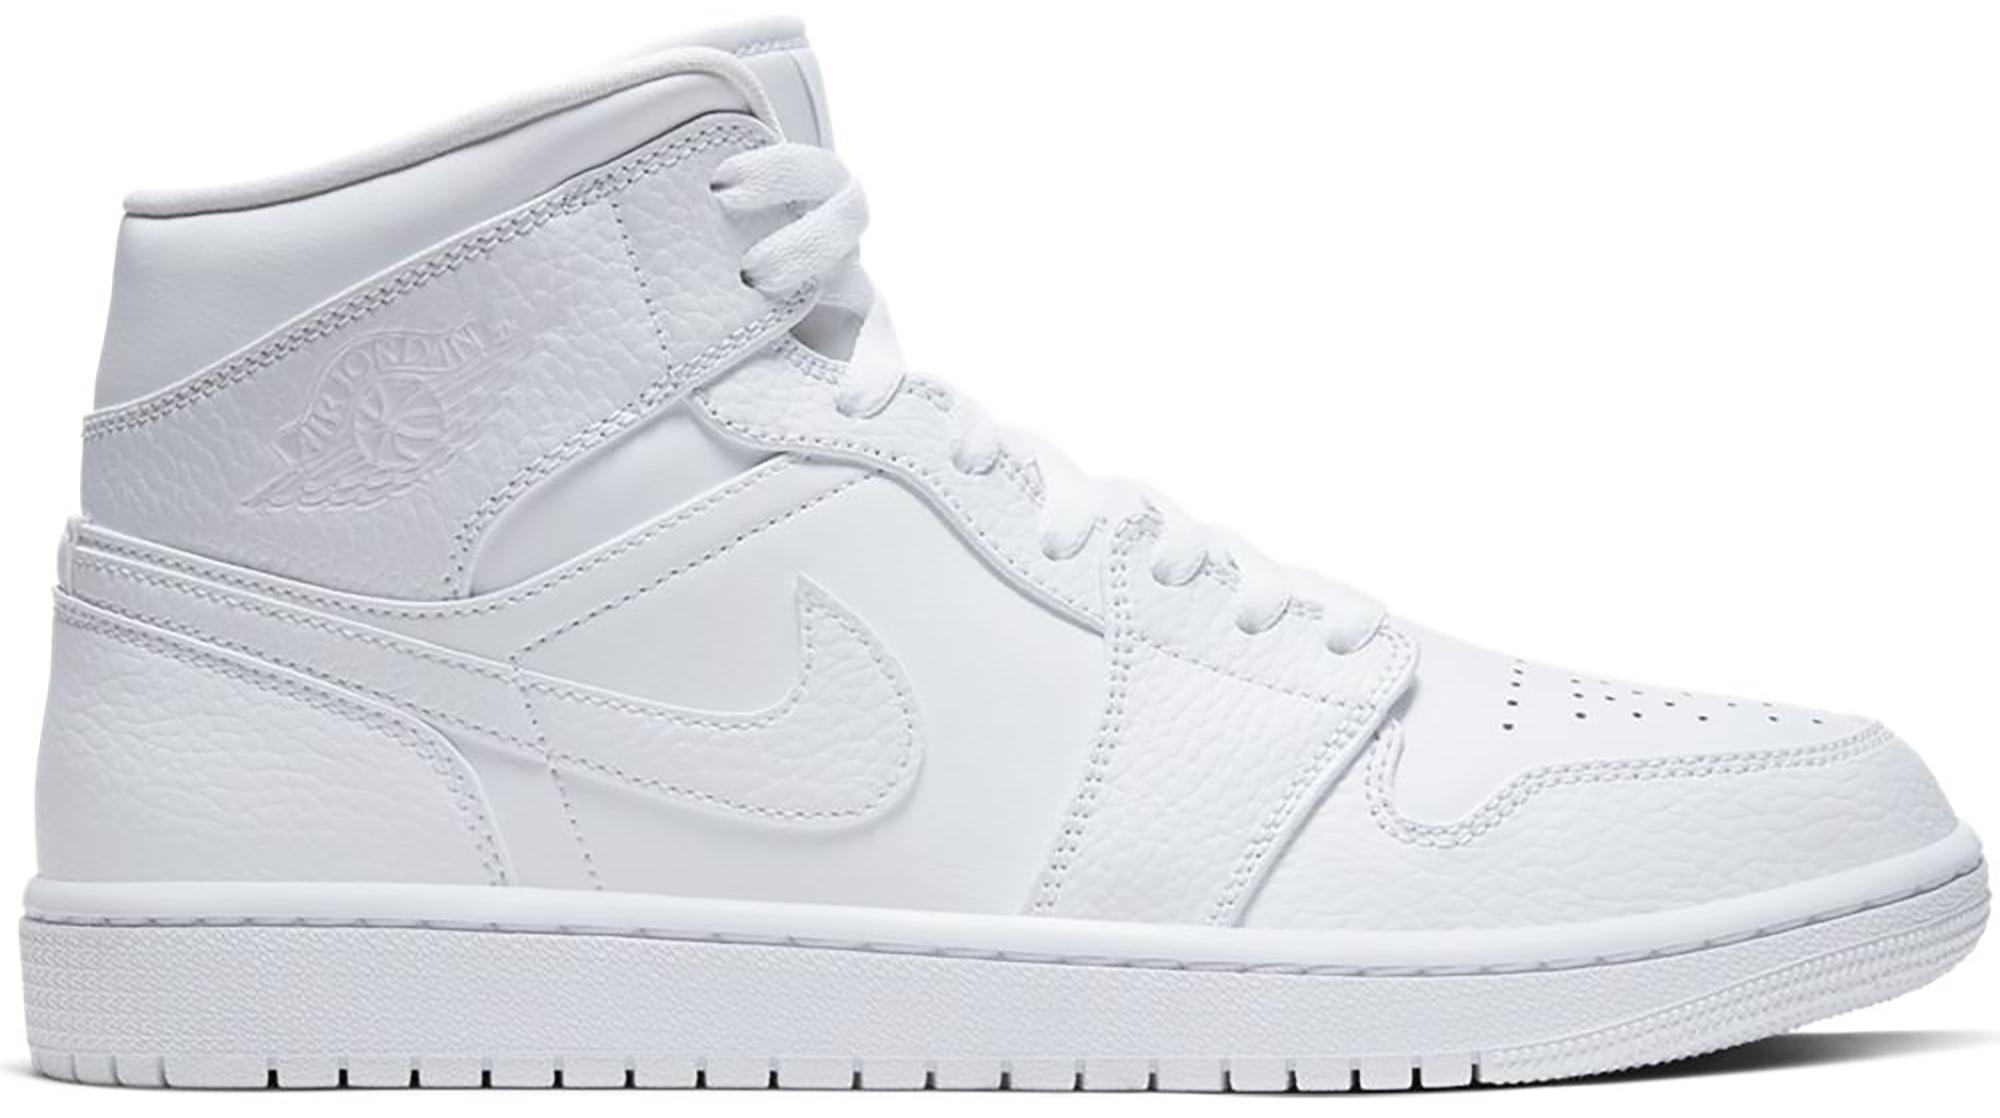 Jordan 1 Mid Triple White 2.0 (2020